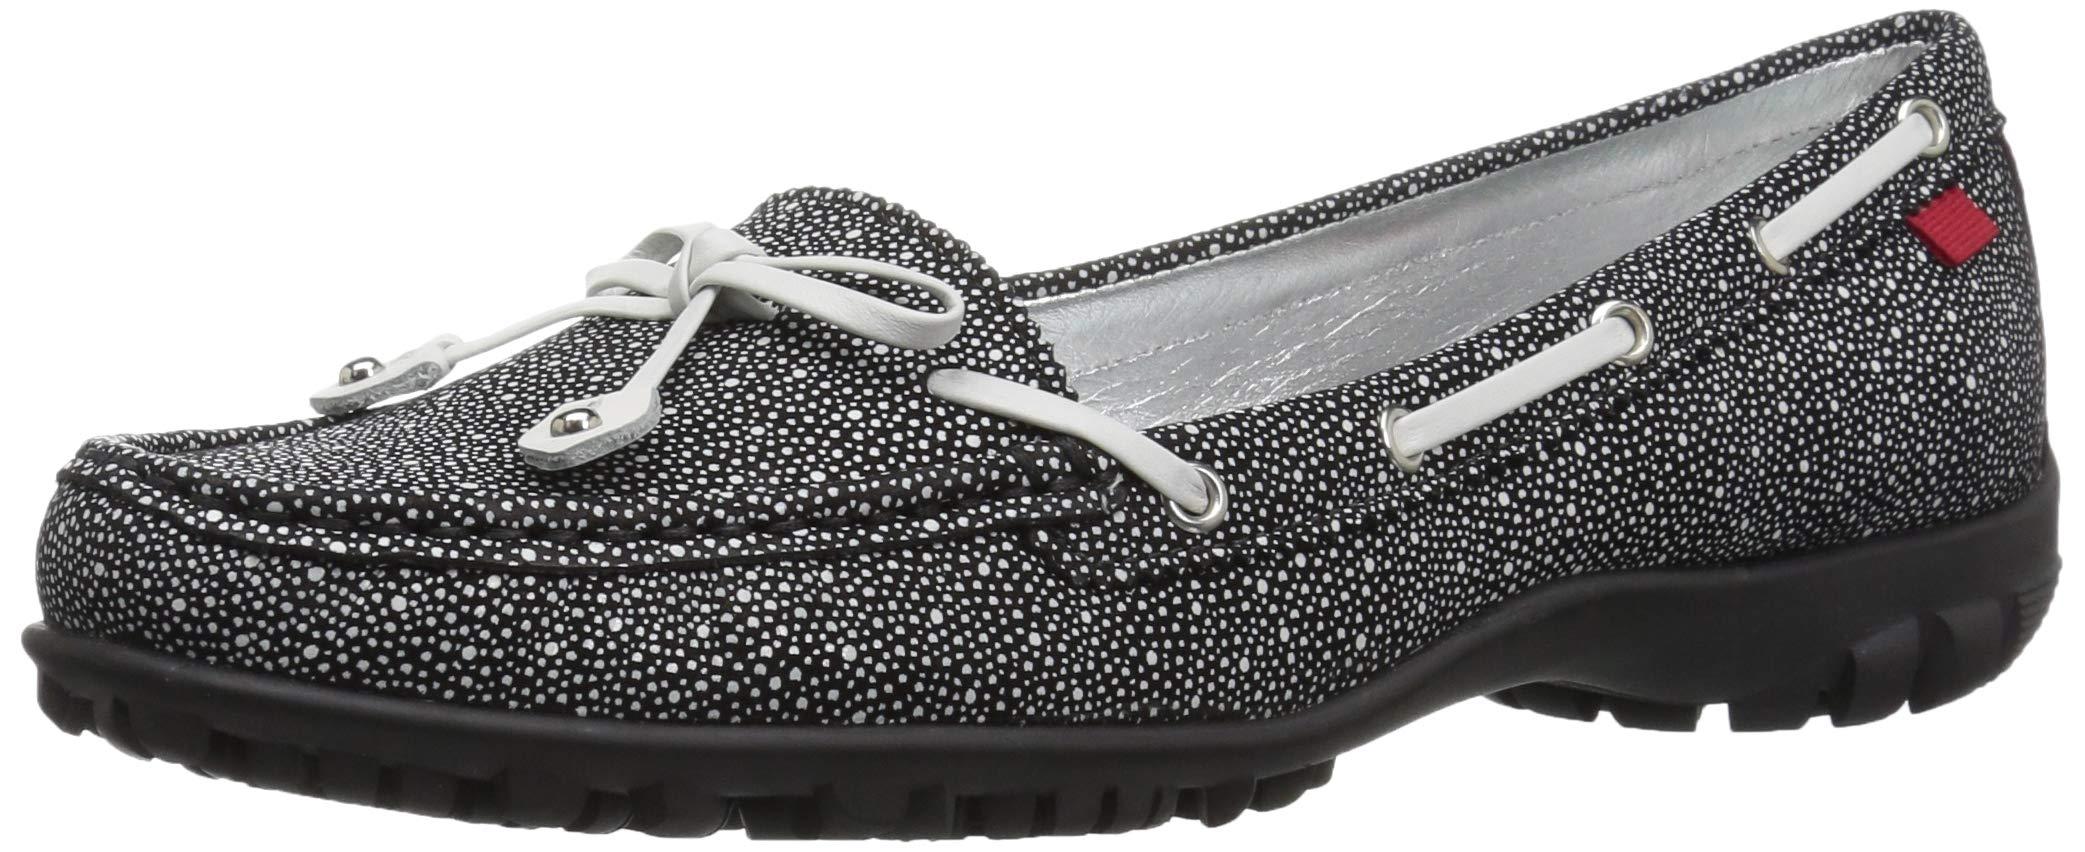 Marc Joseph New York Women's Lexington Golf Shoe